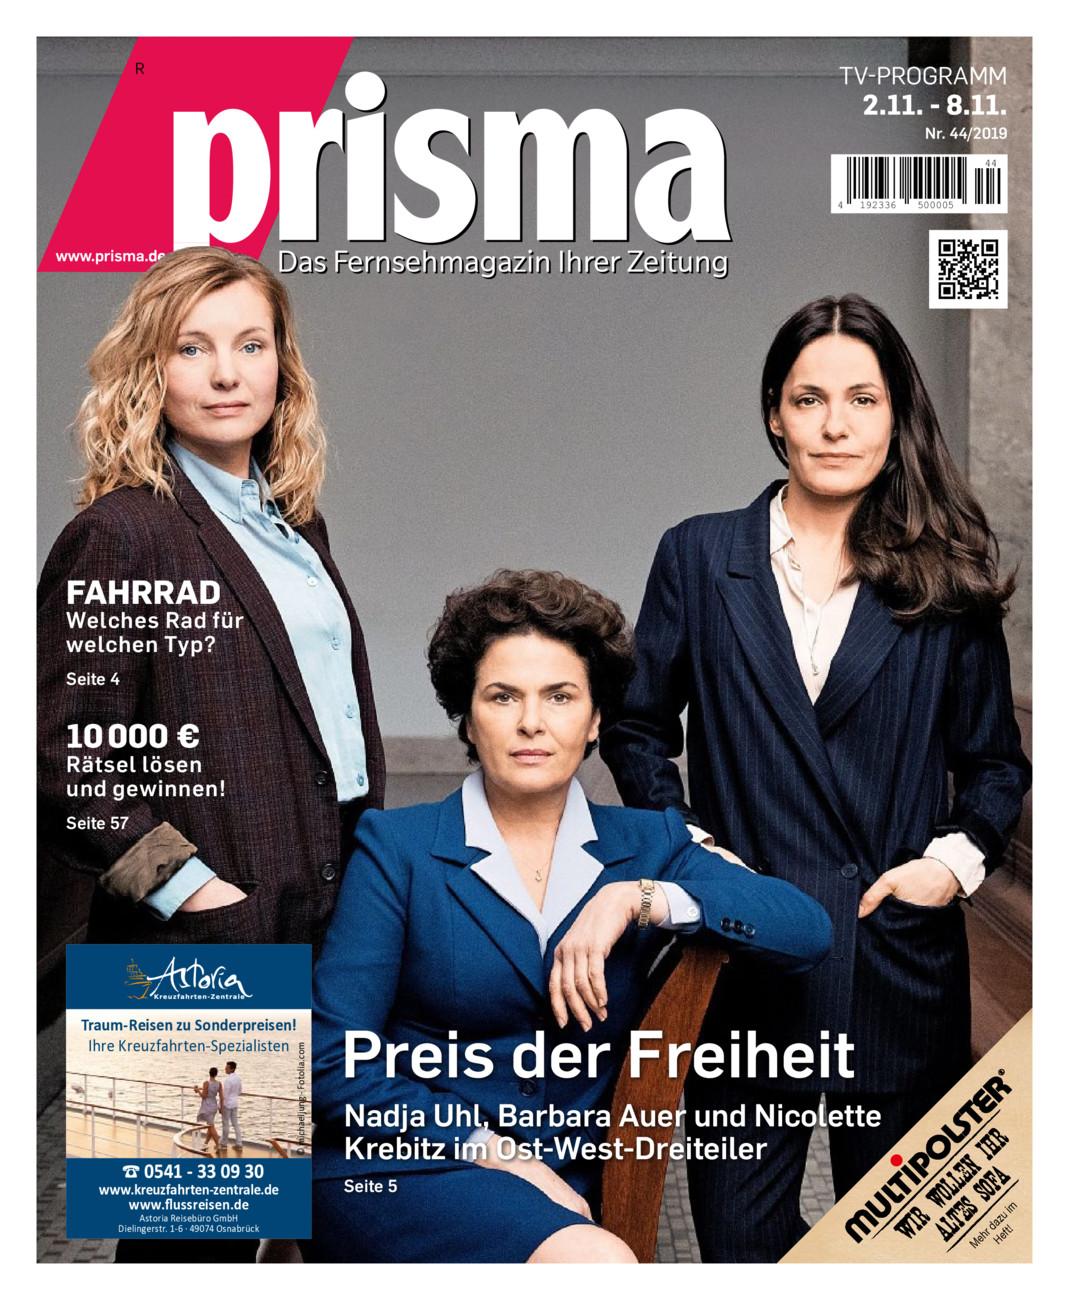 Prisma 02.11. - 08.11.